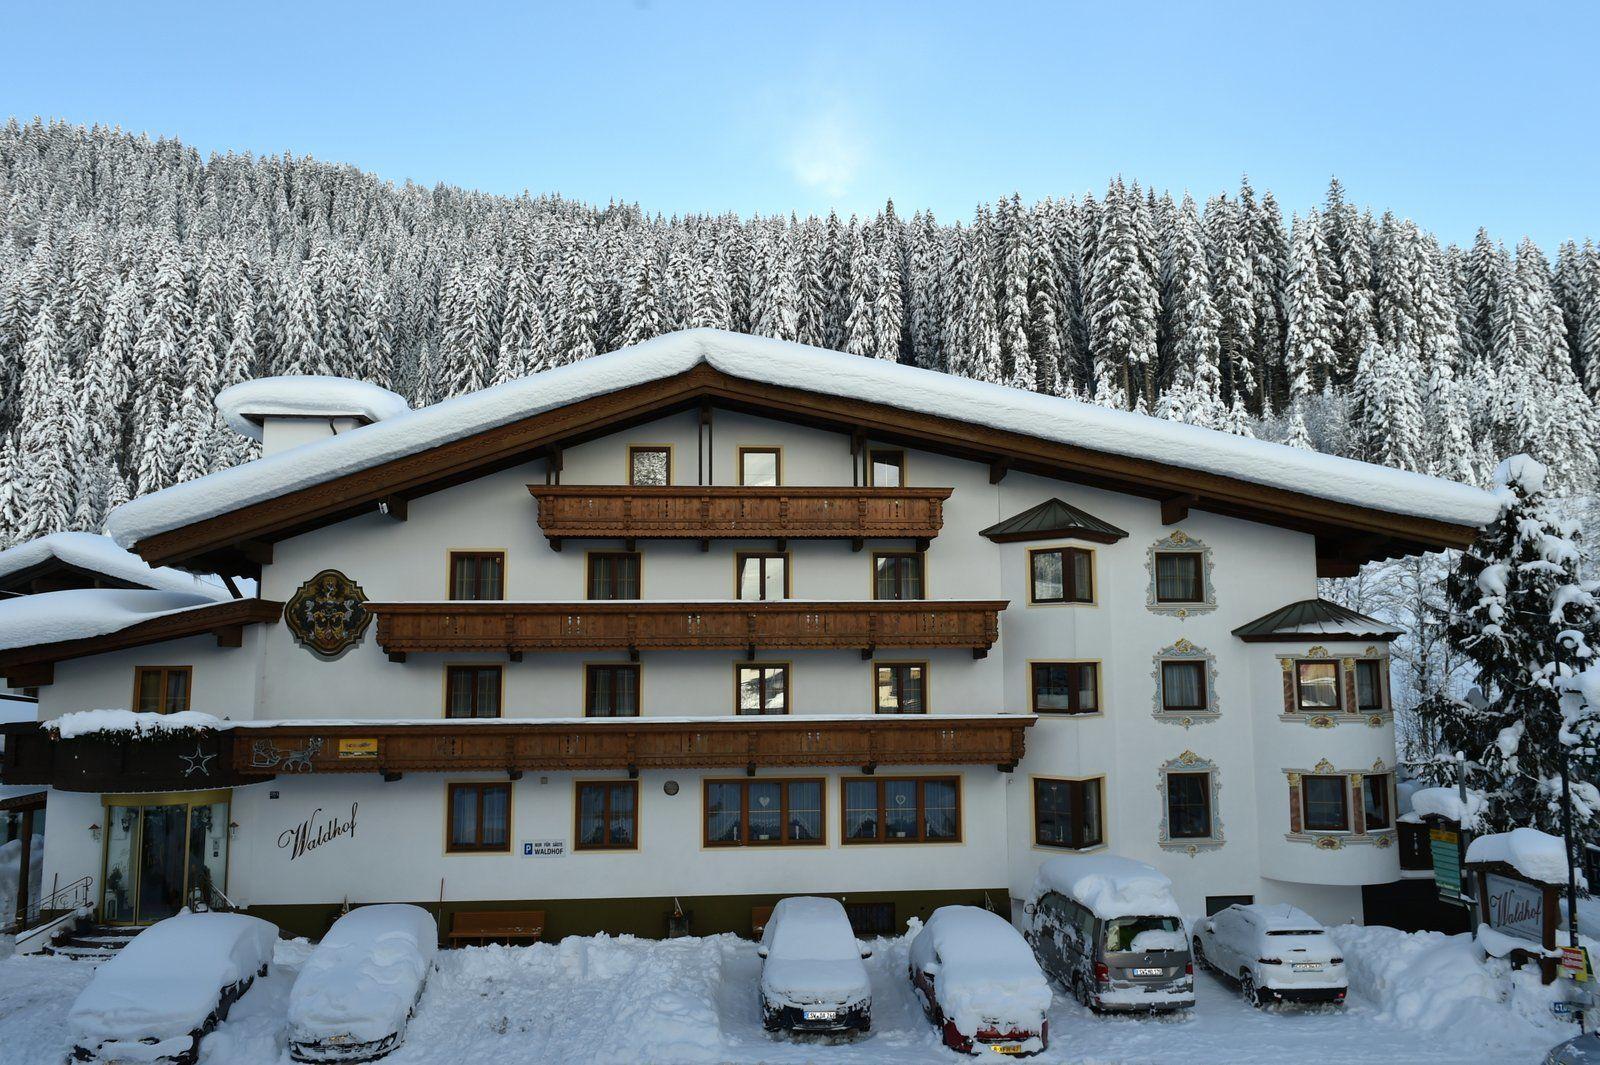 Gerlos - Hotel Pension Waldhof